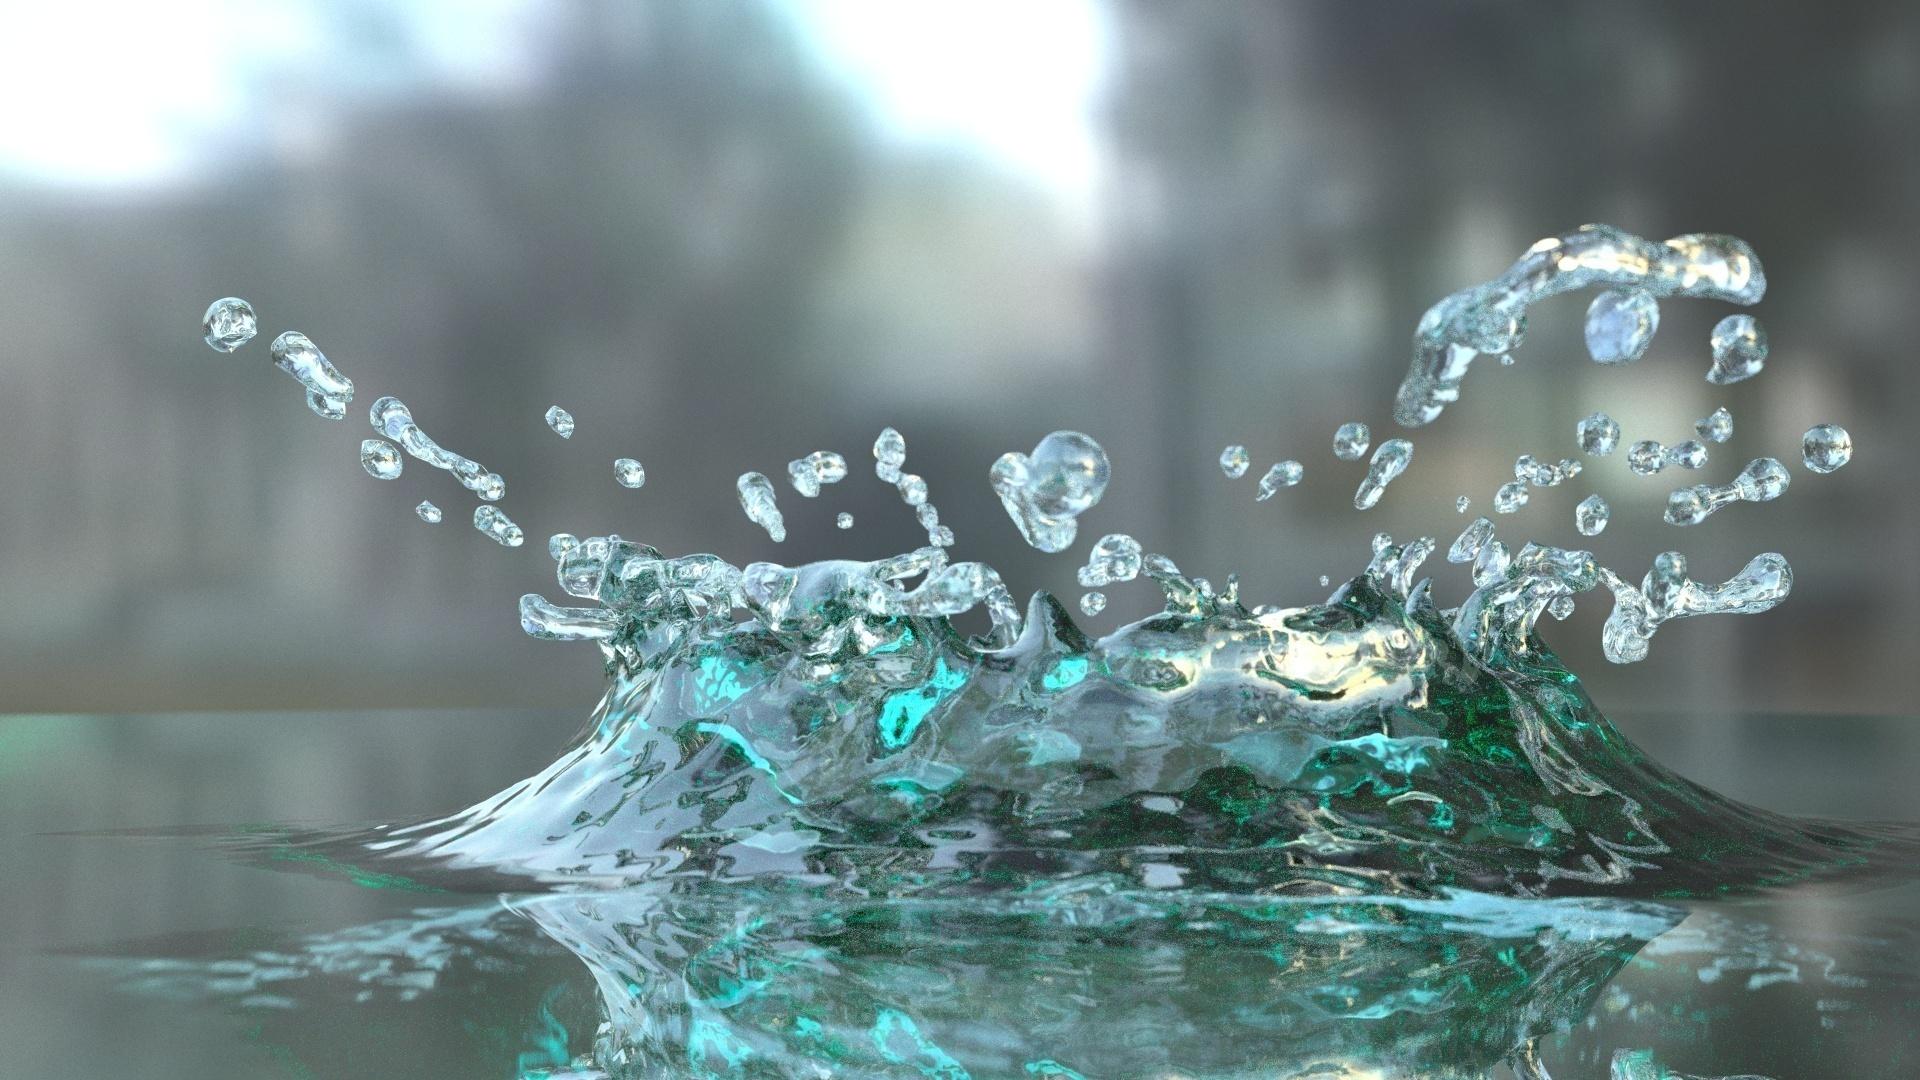 splash ready to make waves